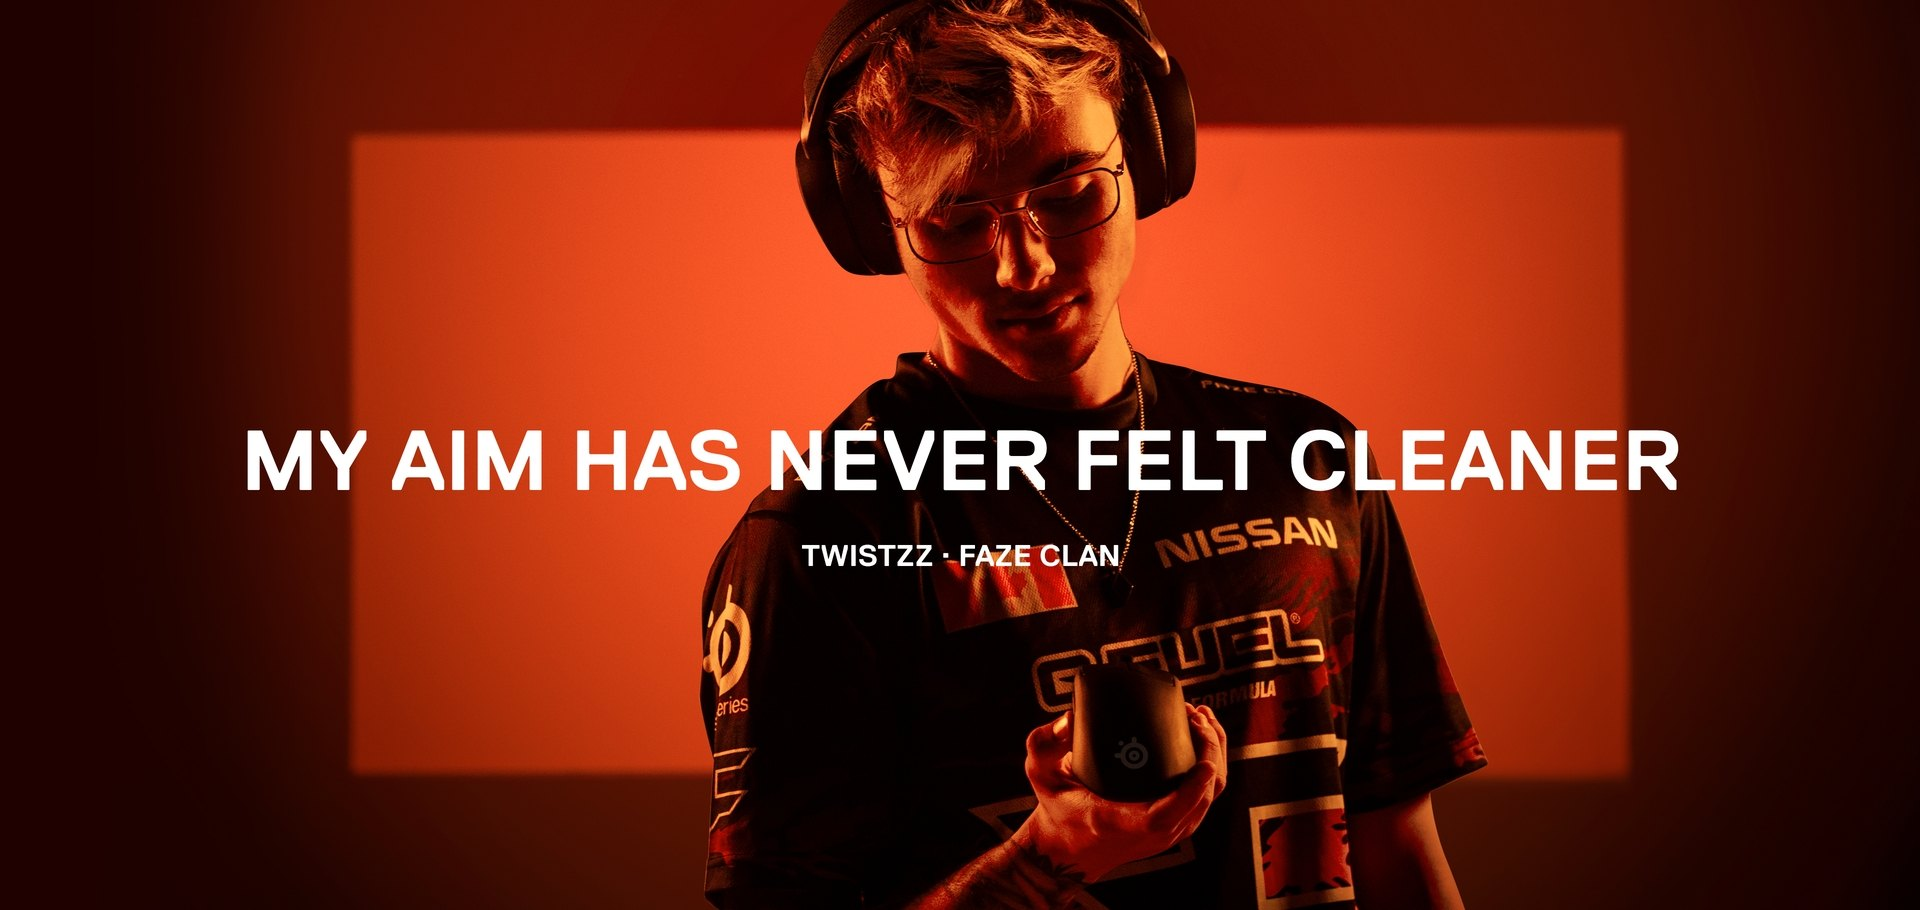 FaZe 玩家 Twistzz 站在橘色背景之前,手上拿著 Prime 滑鼠。圖片上的字樣為:「我的瞄準度從未如此精確過。」